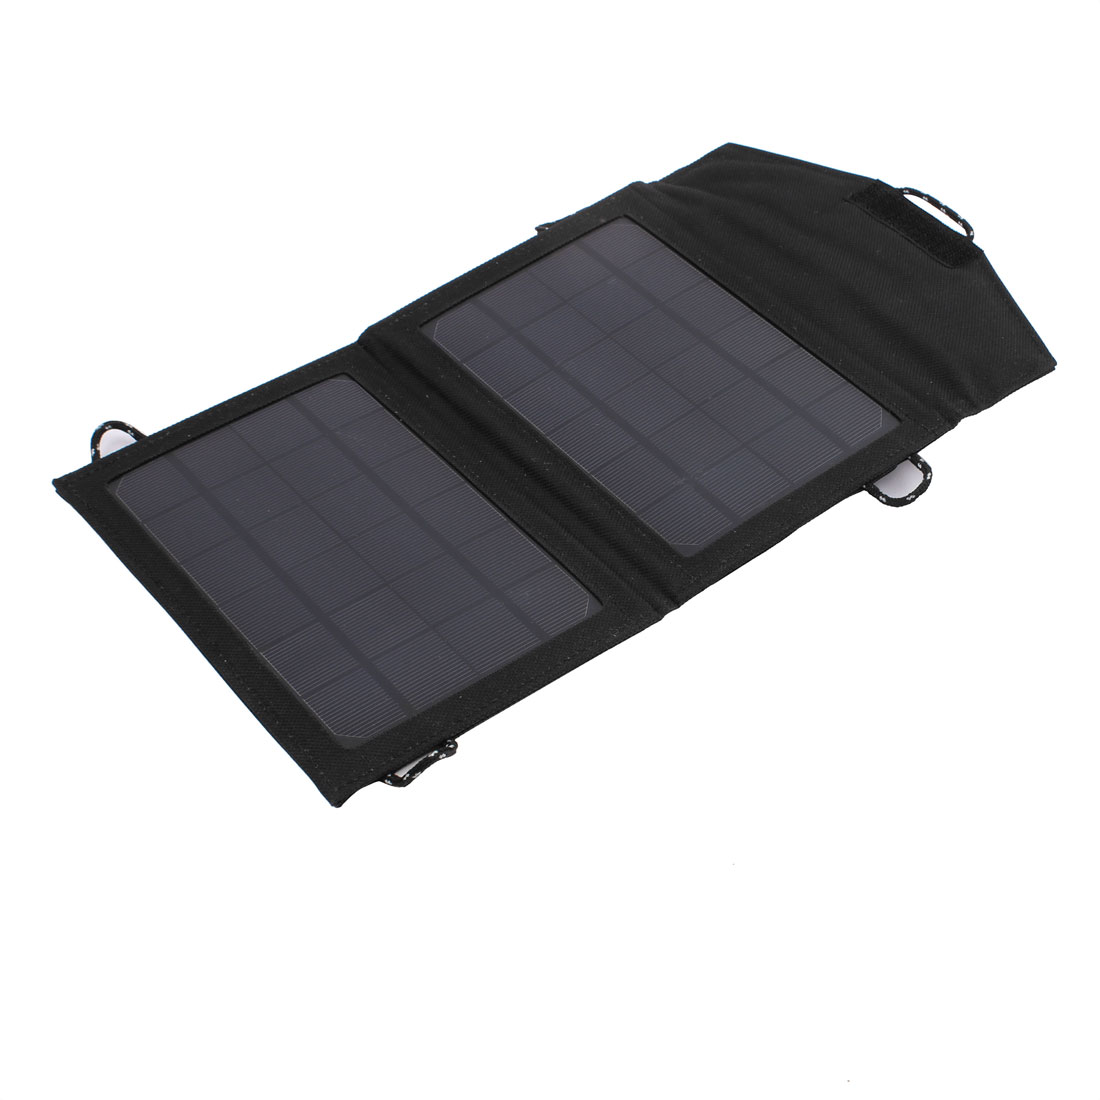 5W Monocrystalline One Ports USB Foldable Portable Solar Panel Charger Black